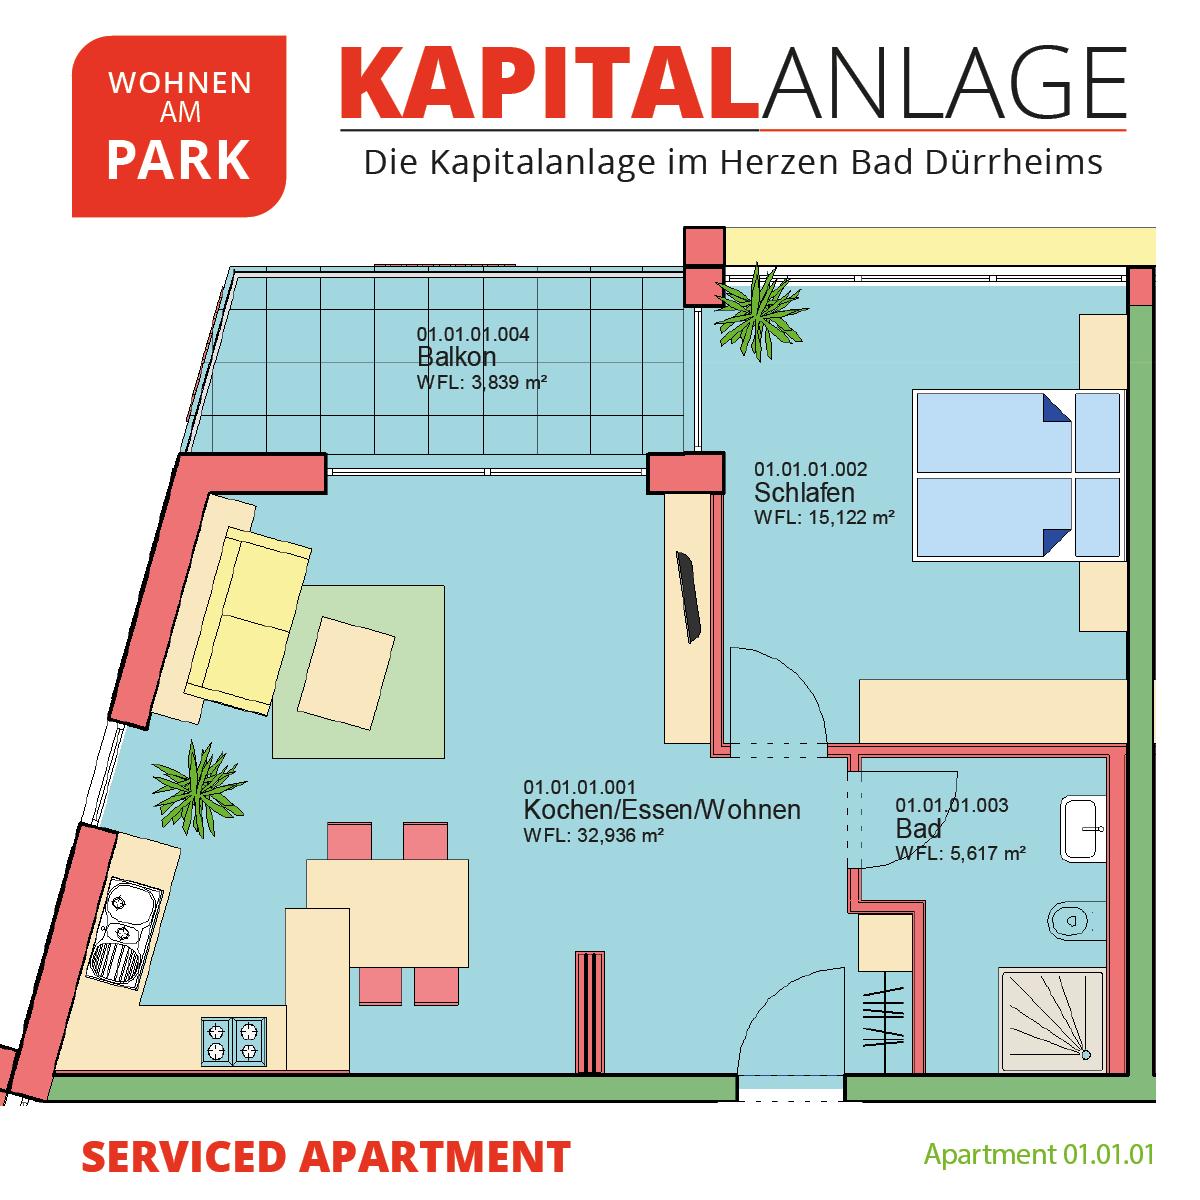 Kapitalanlage Apartment 01.01.10 Grundriss - Bad Dürrheim